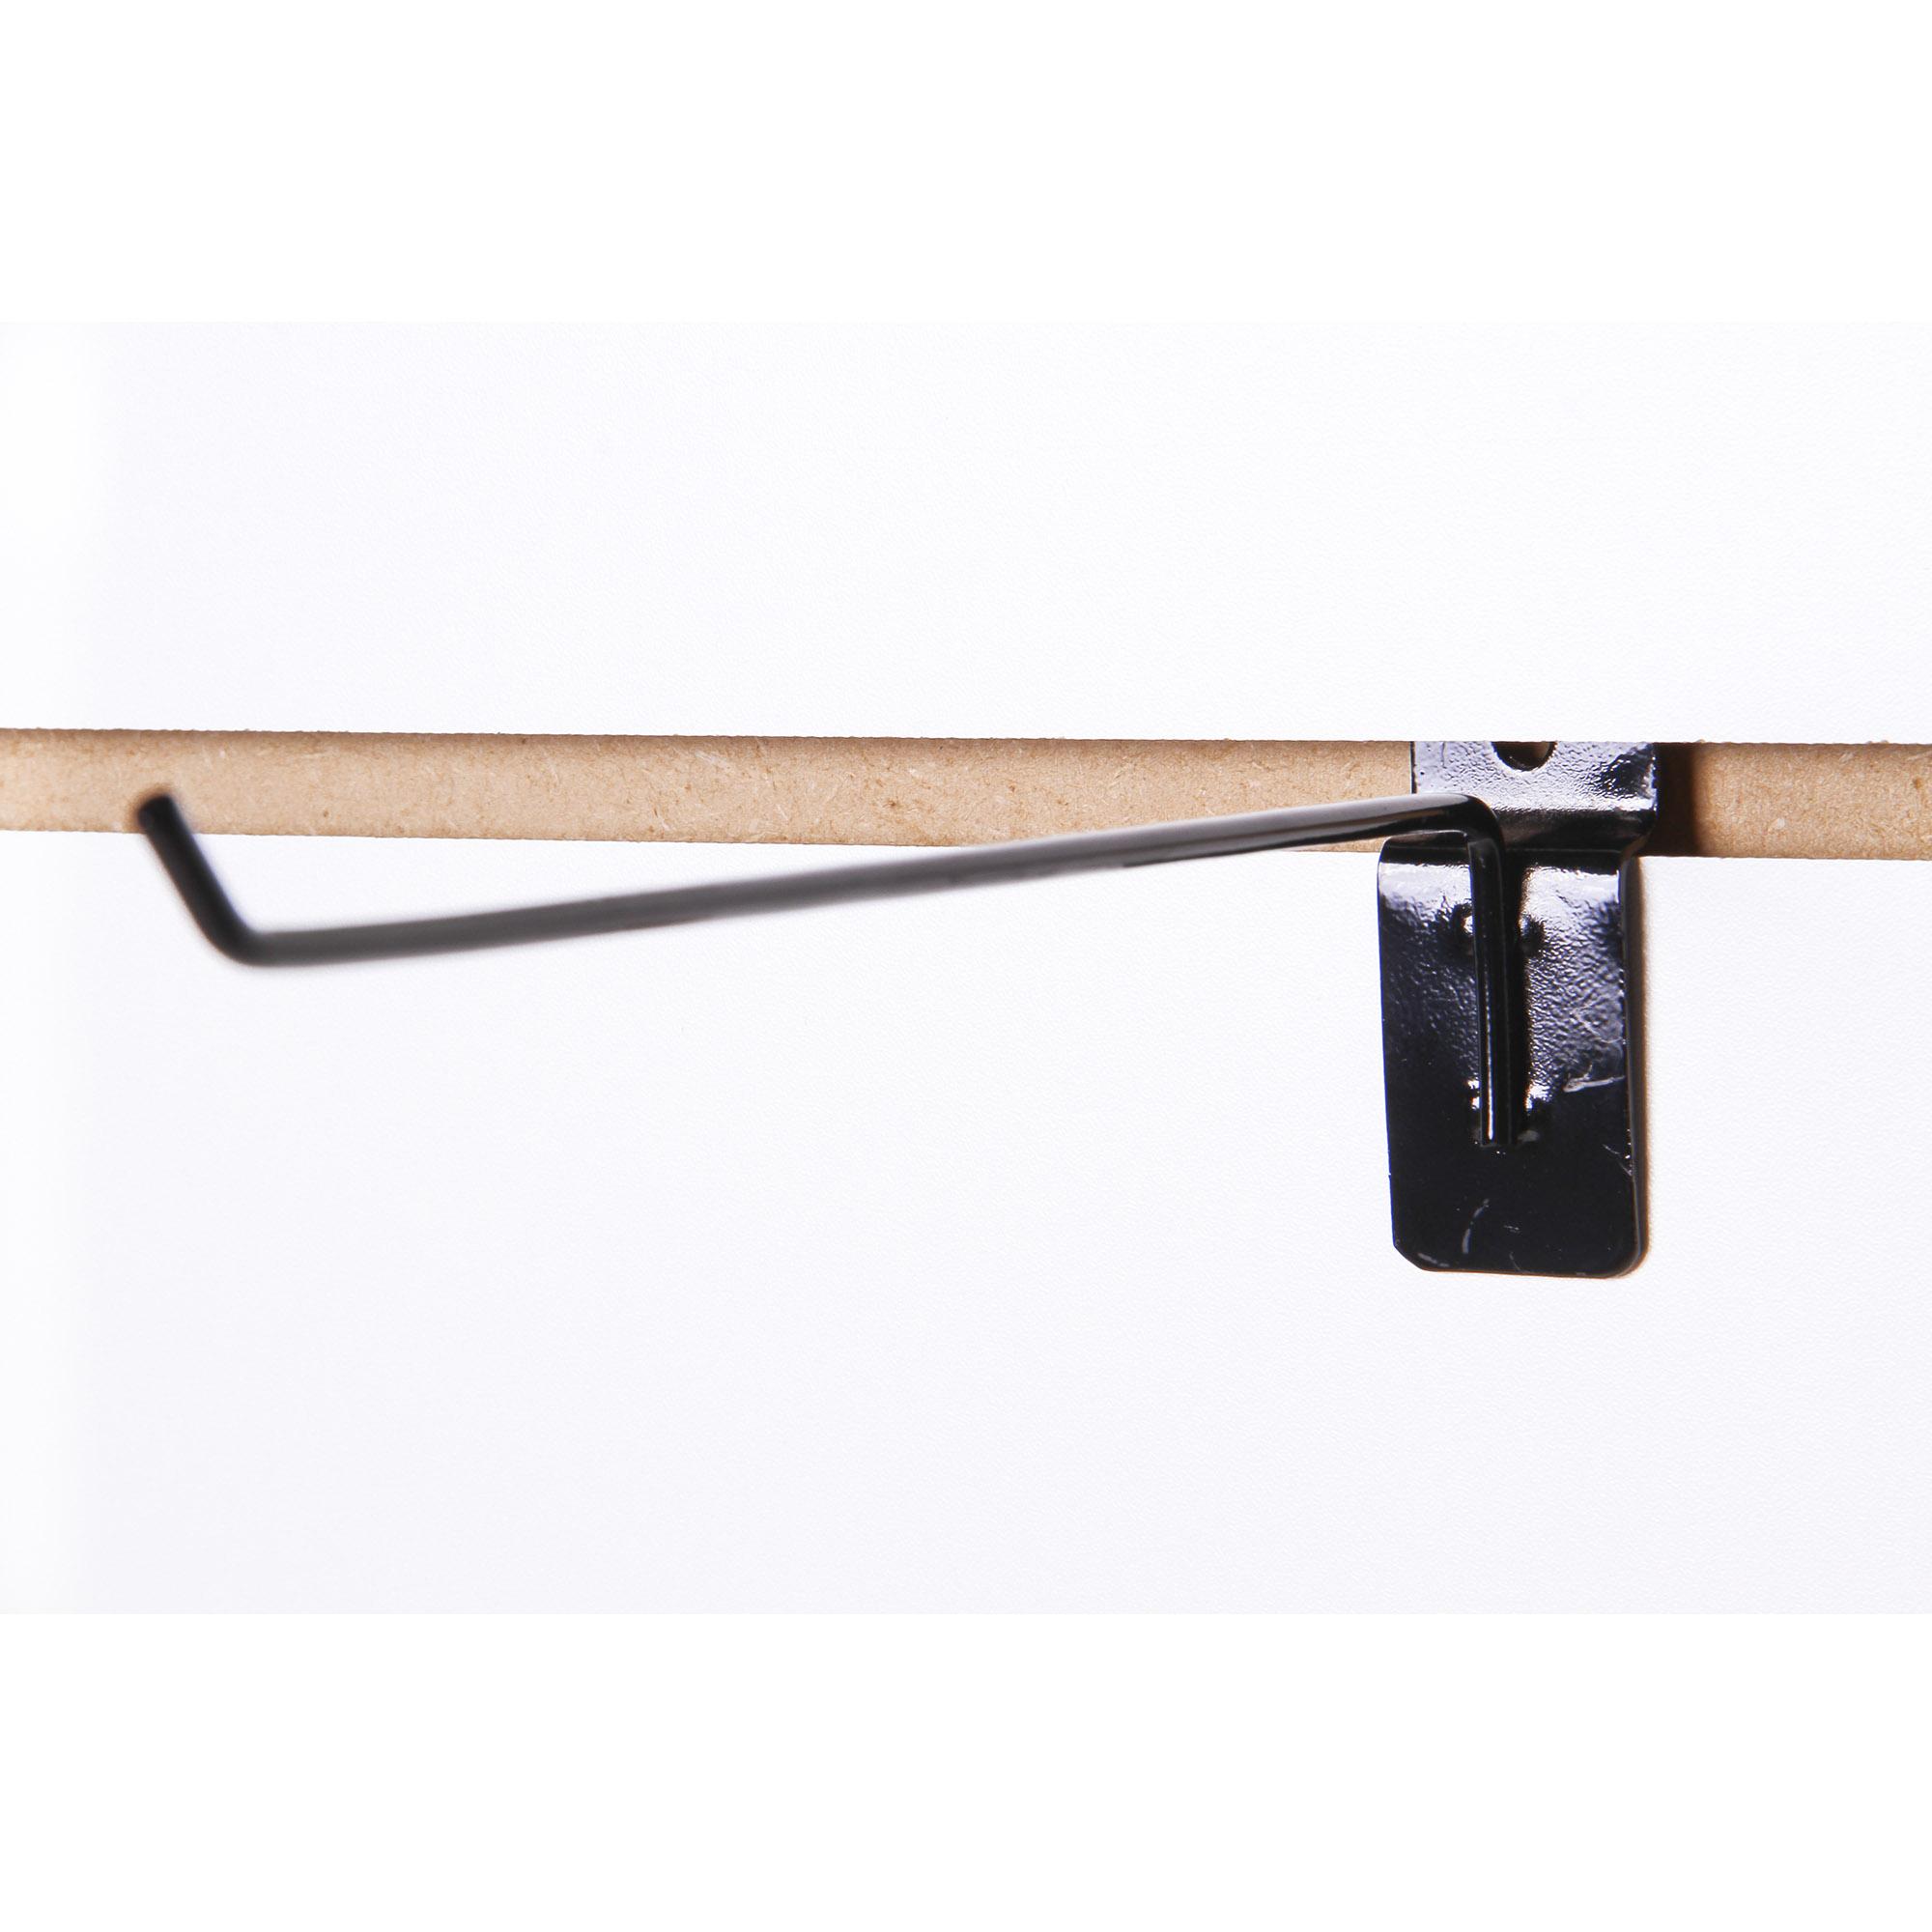 Kit Gancho Painel Canaletado 25cm - 50 unidades